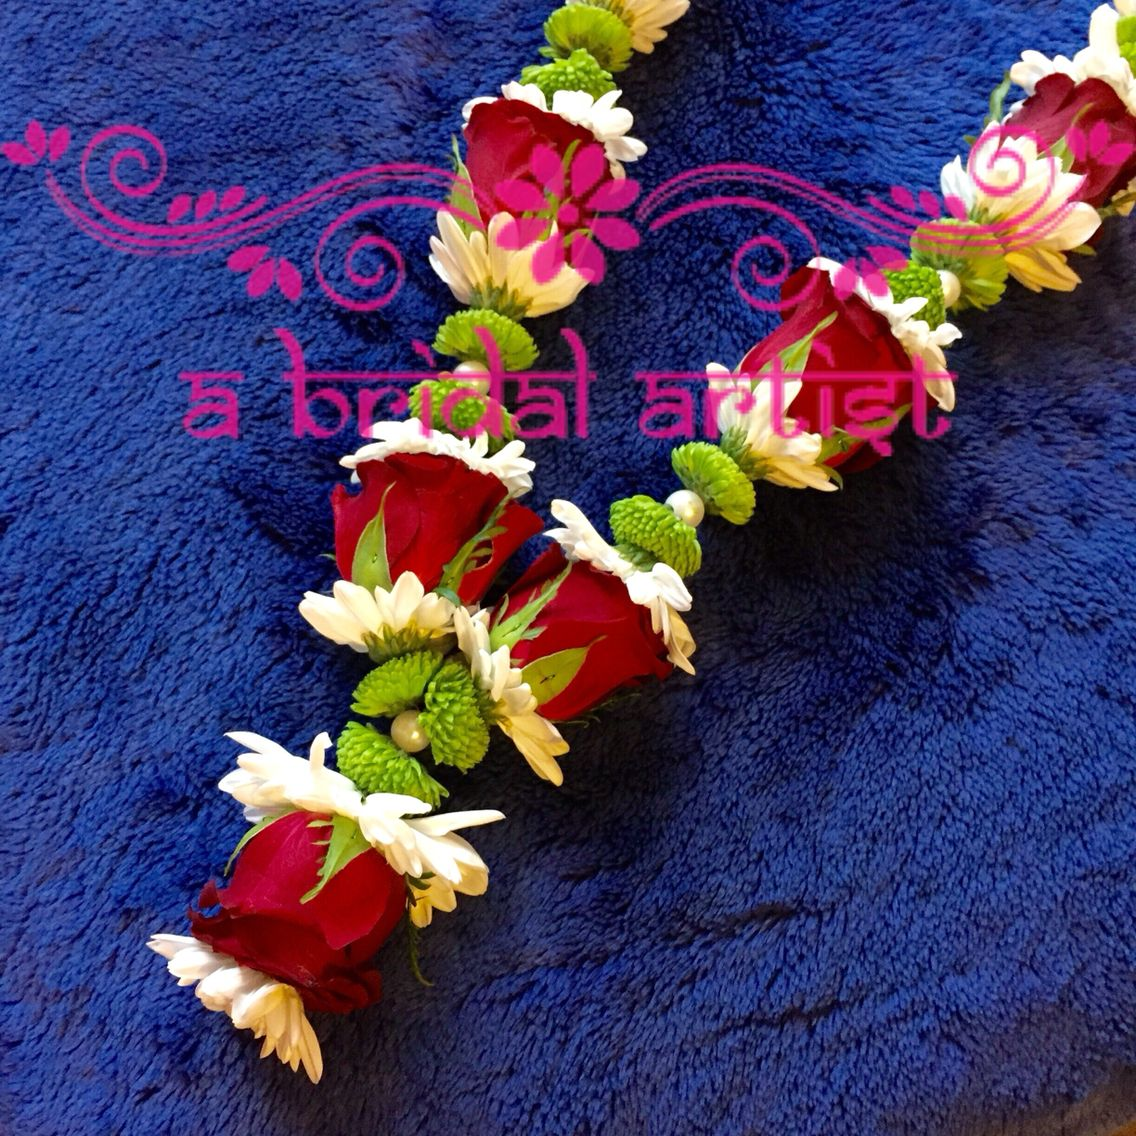 Exquisite designer wedding garland jaimala haar varmala made from fresh